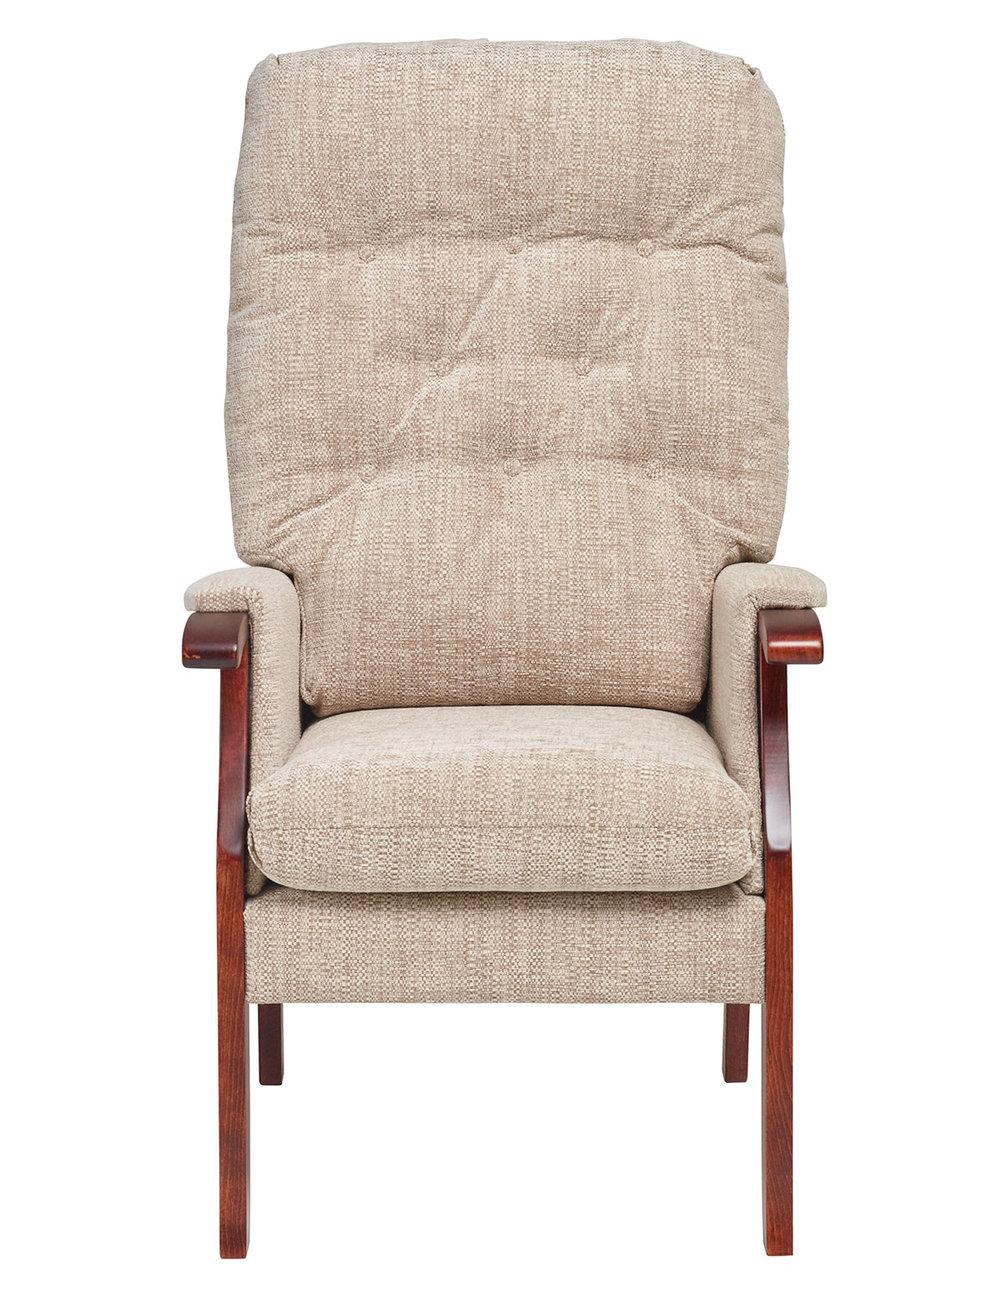 Kempton 1 Seater